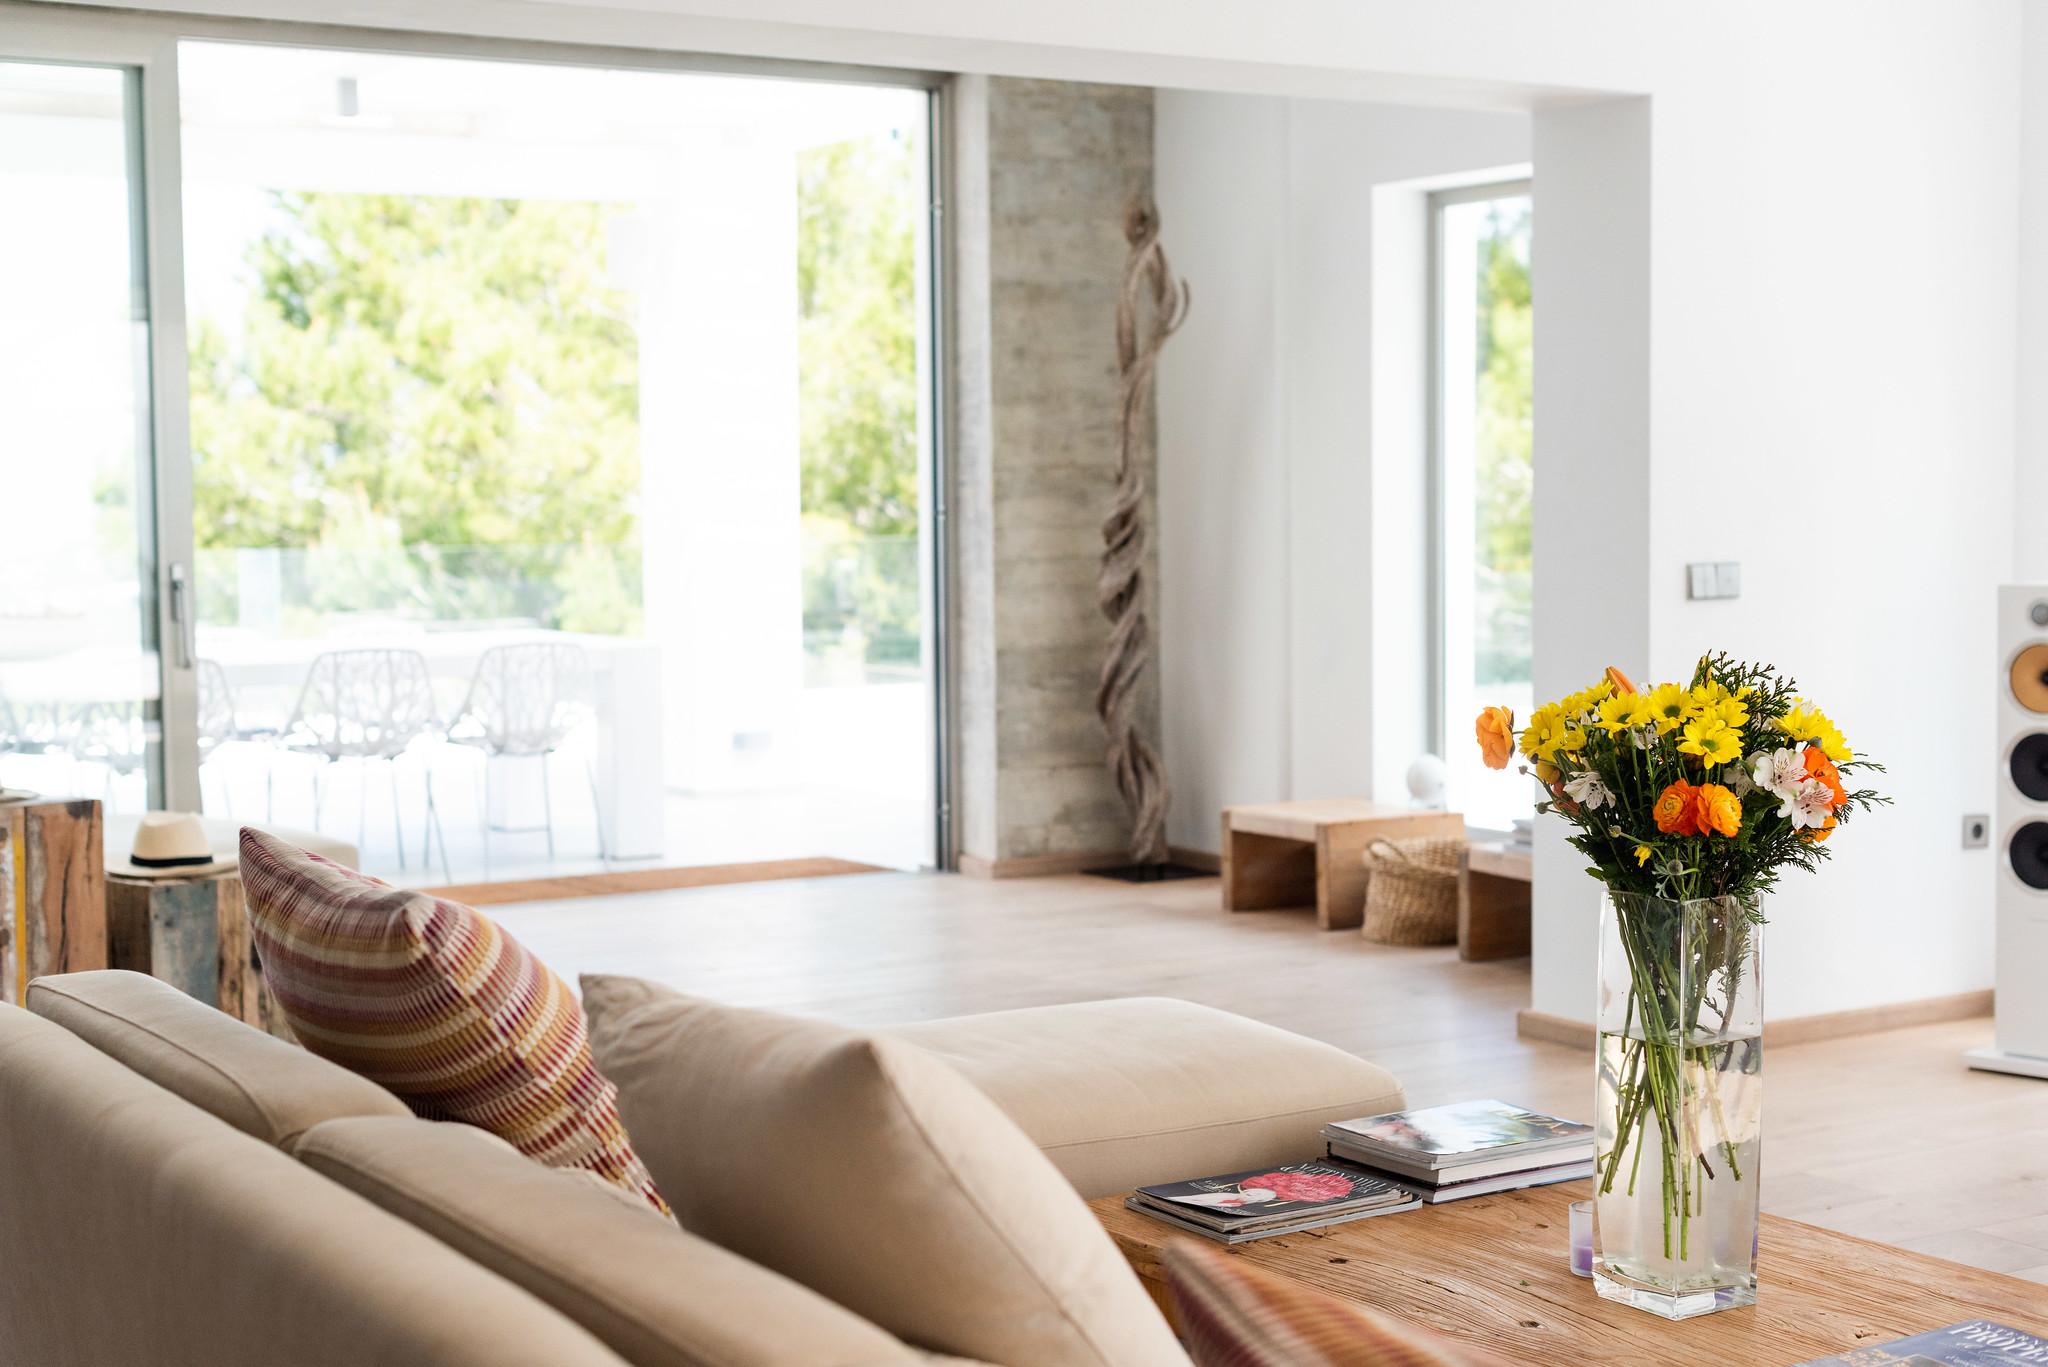 https://www.white-ibiza.com/wp-content/uploads/2020/05/white-ibiza-villas-can-dela-living-room.jpg